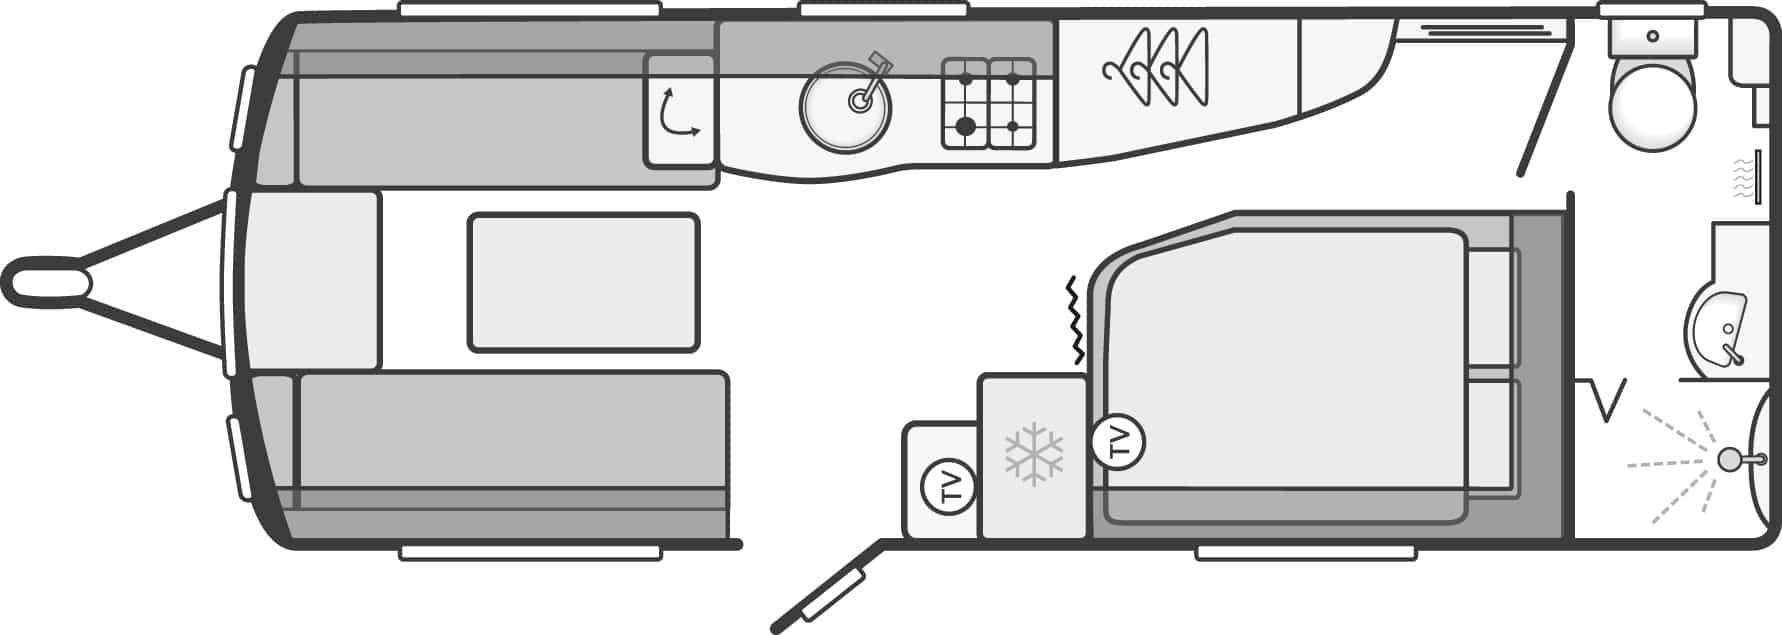 Conqueror 570 - 4 Berth, Side Fixed Bed, End Washroom